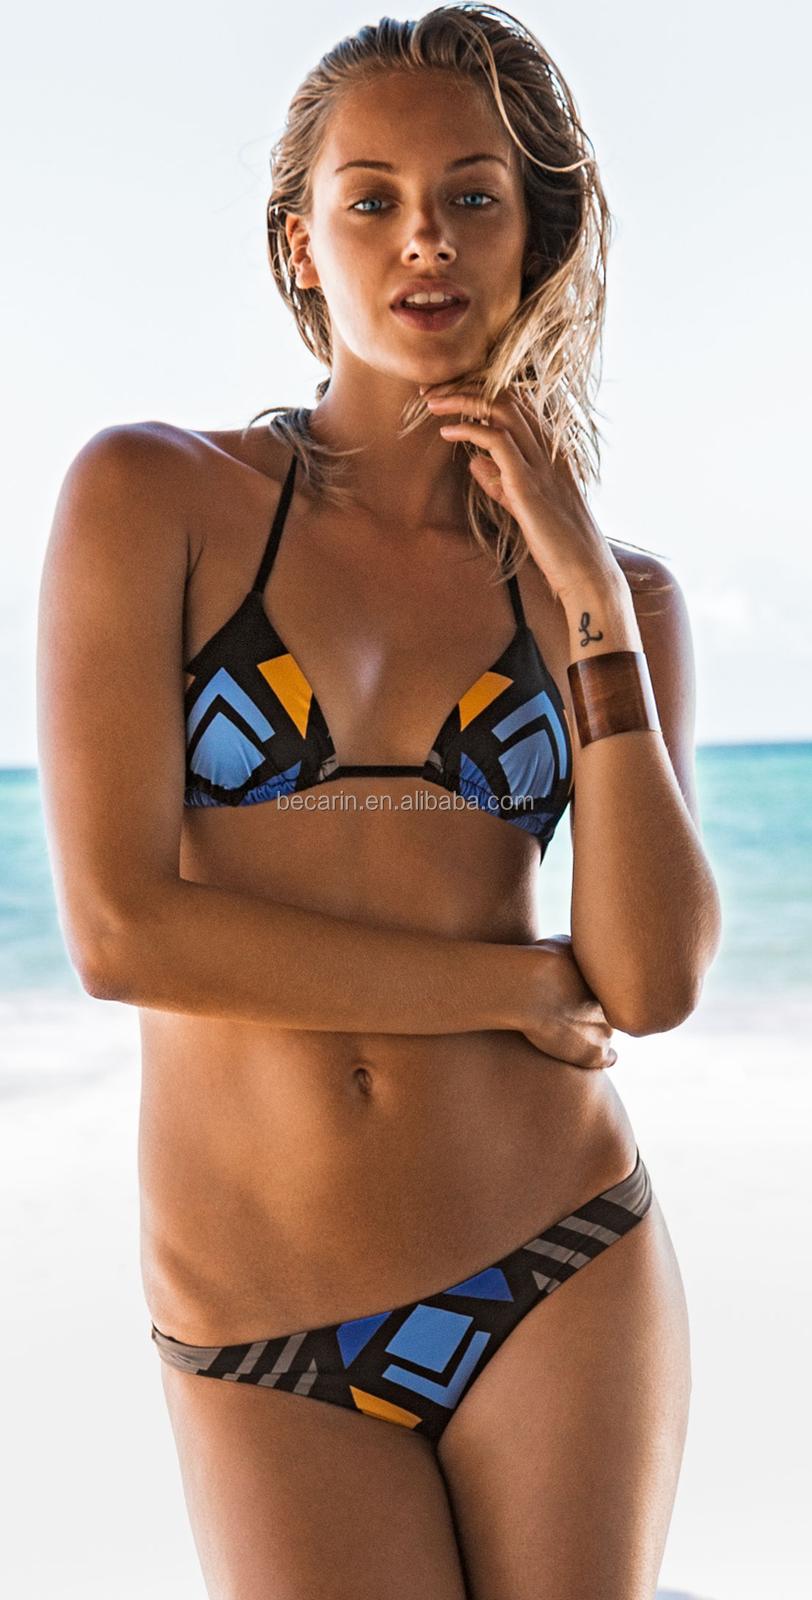 Chicas Super Micro Sexi Caliente Chica Bikini Fotos Modelos Buy Xxx Sexy Bikini Chica Traje De Baño Fotossuper Micro Sexi Bikinibikini Modelos